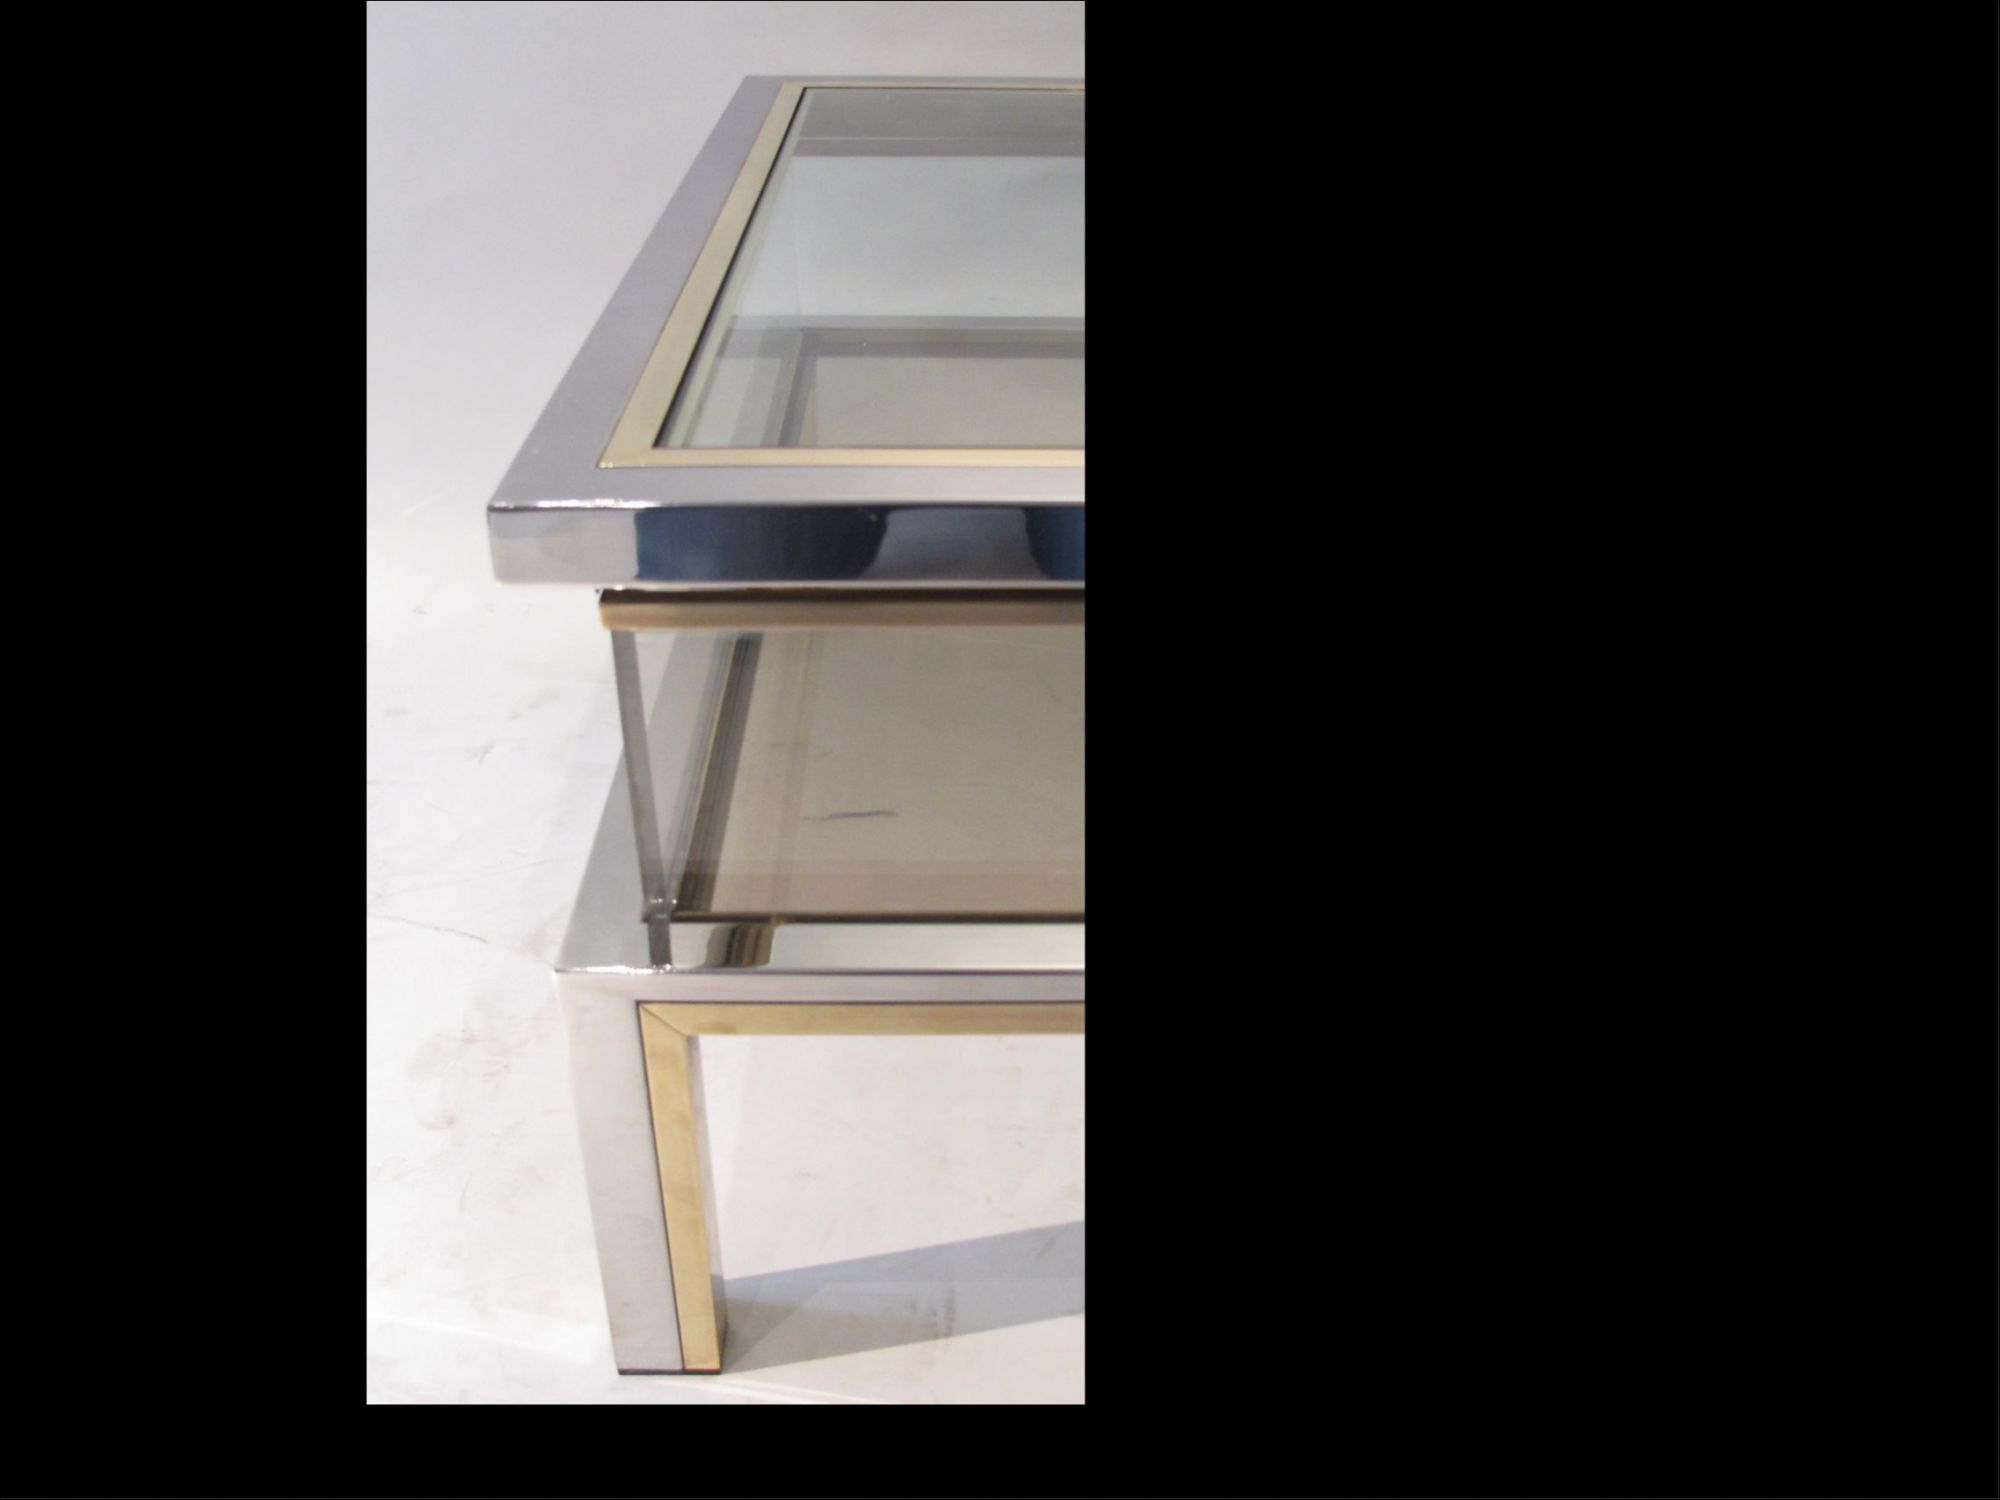 Fabelhaft Vitrine Modern Referenz Von A Vintage Brass & Chrome Coffee Table